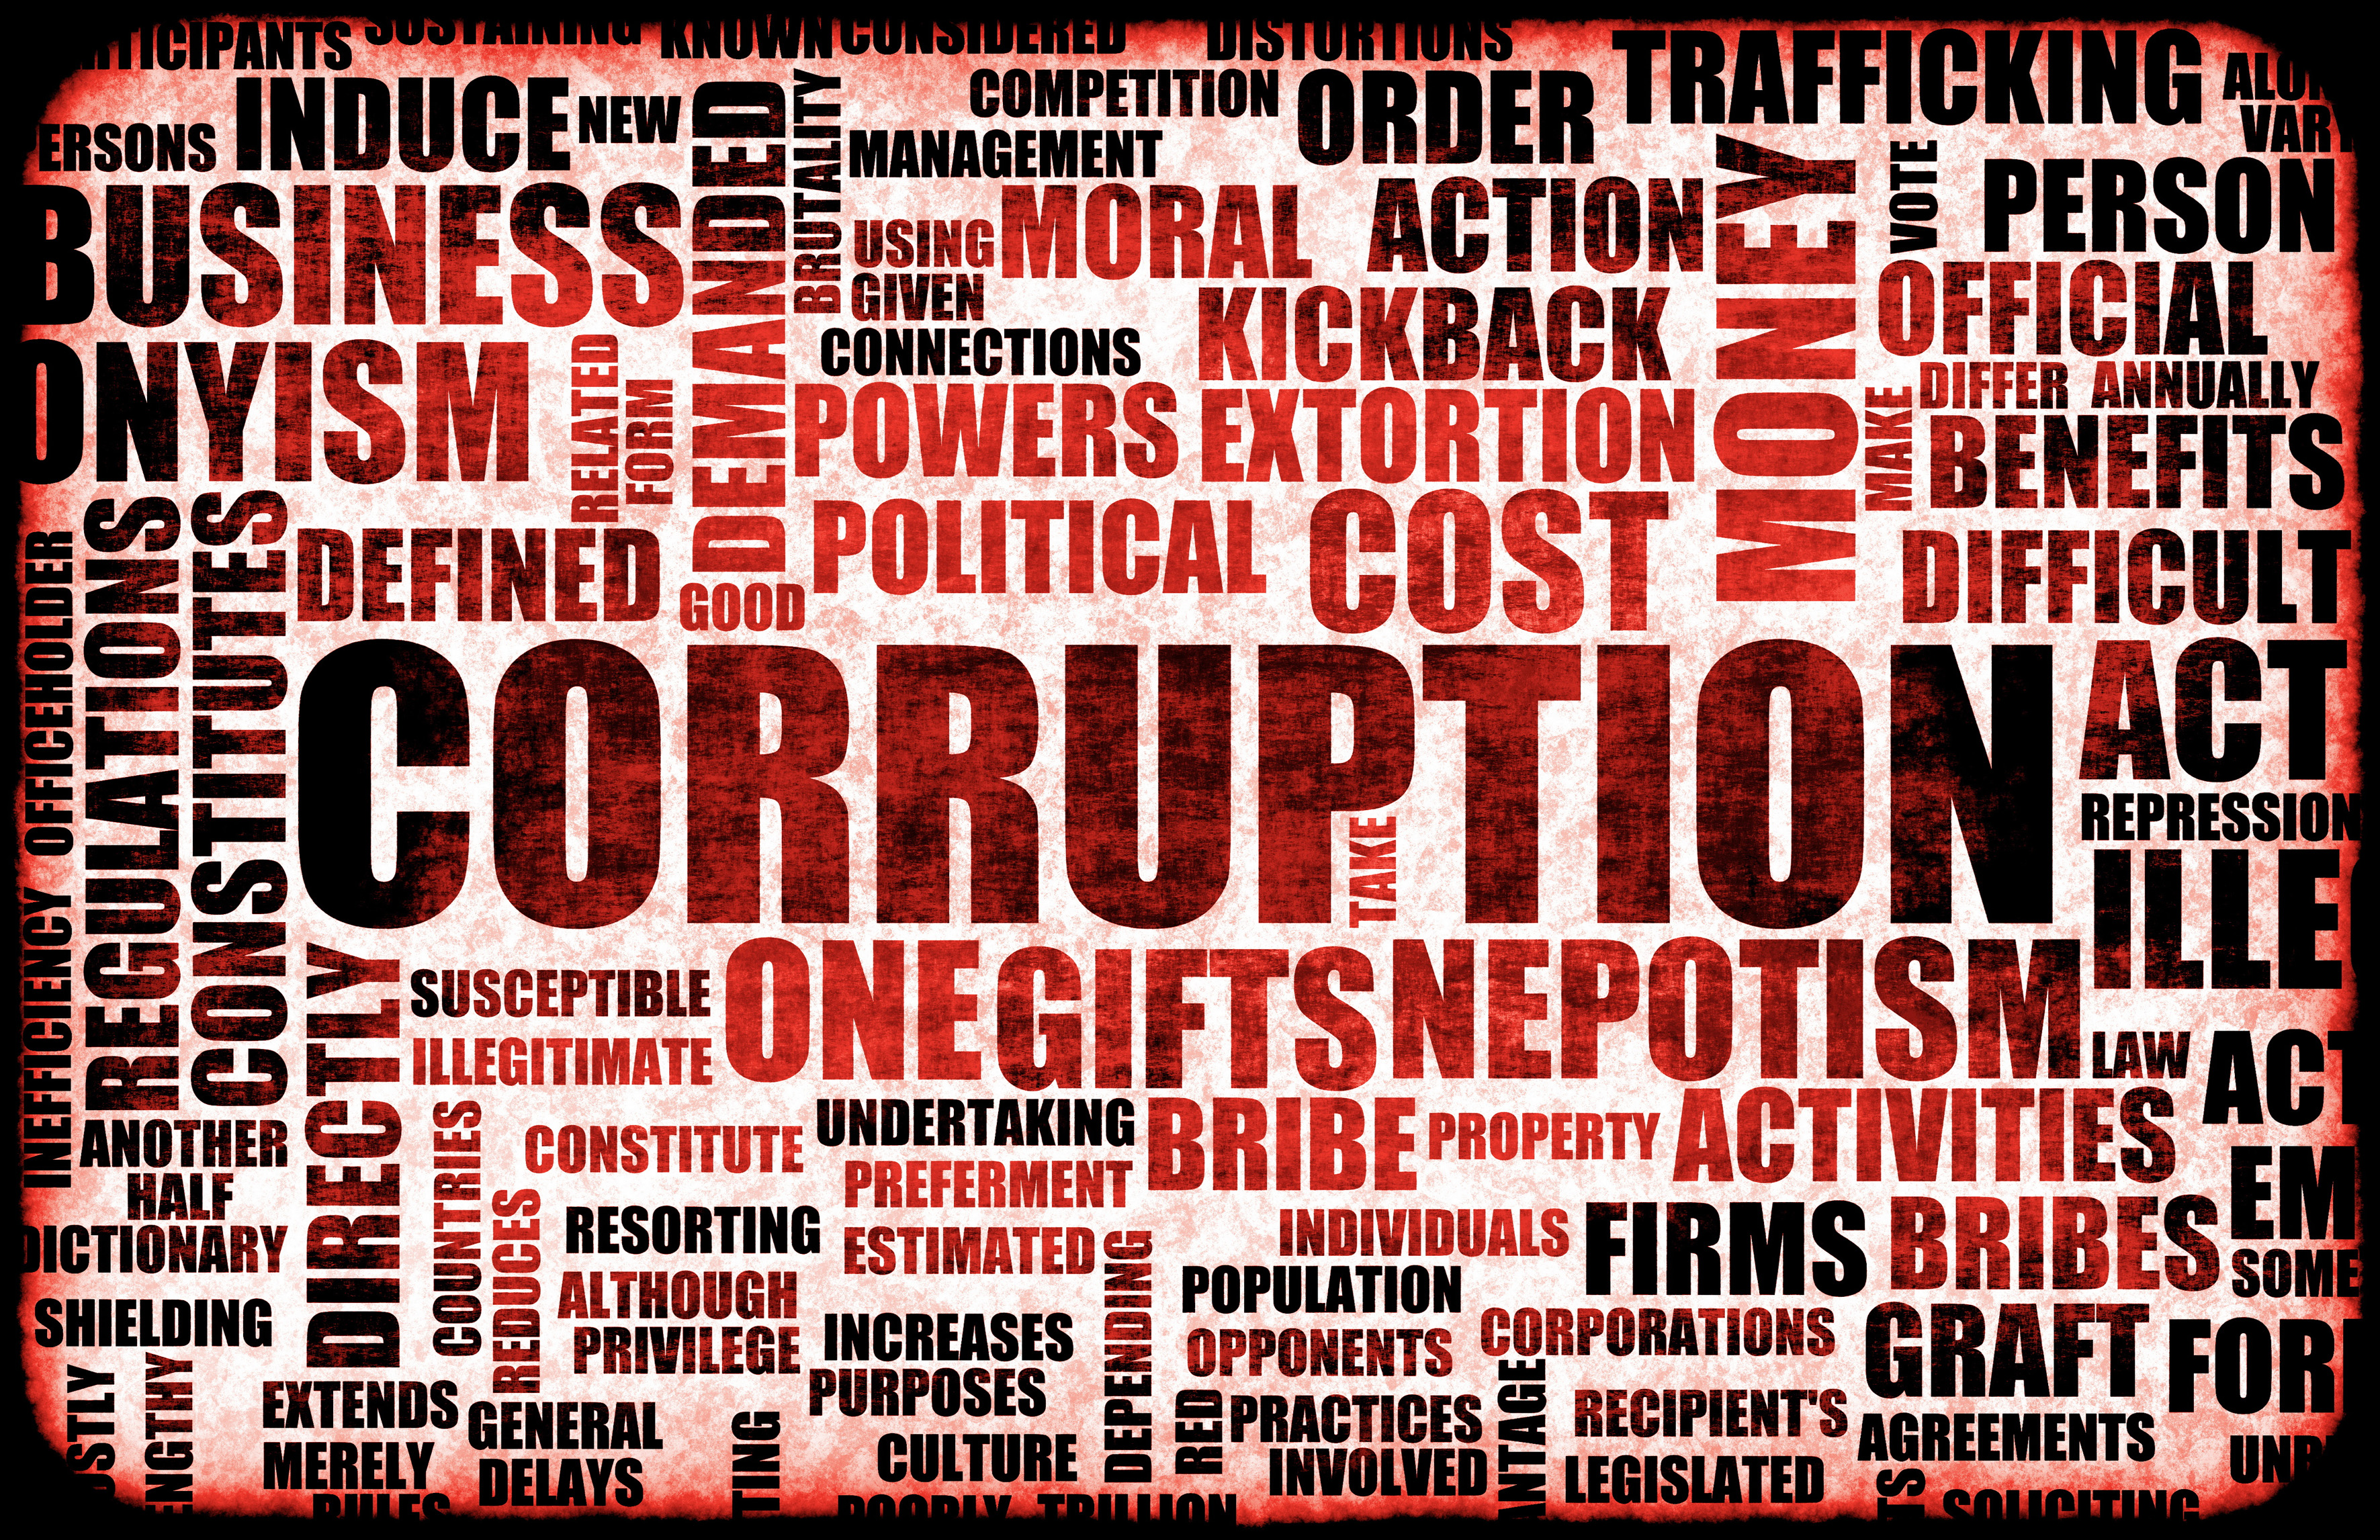 corruption and bribery practice sof public